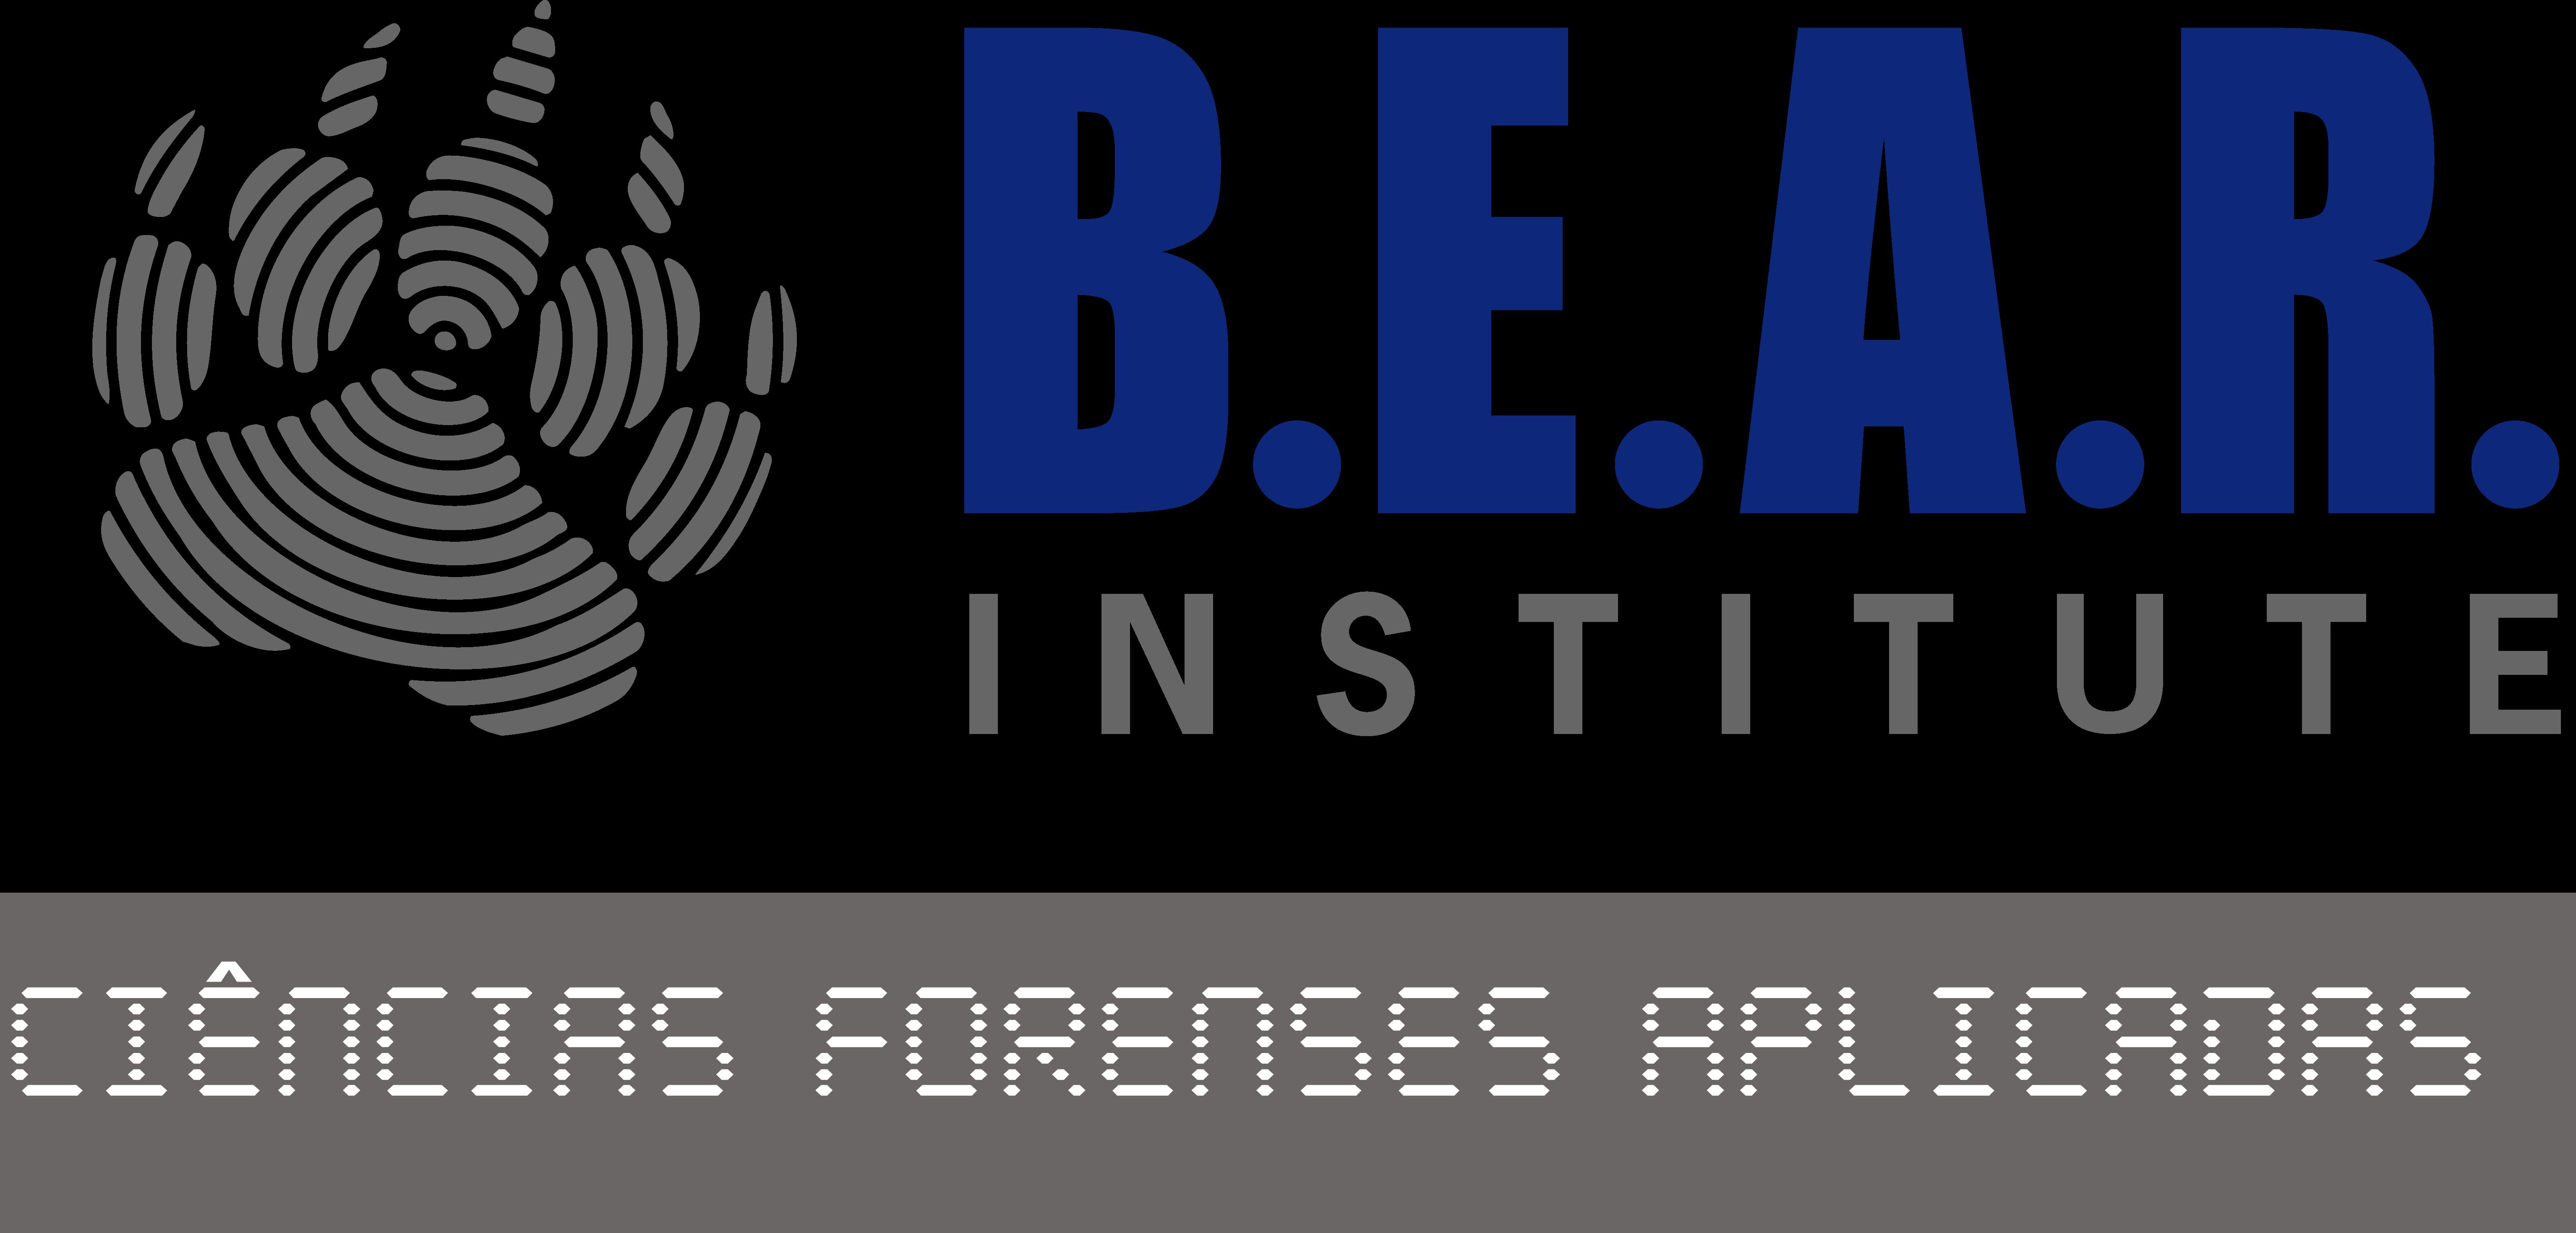 B.E.A.R. INSTITUTO PT